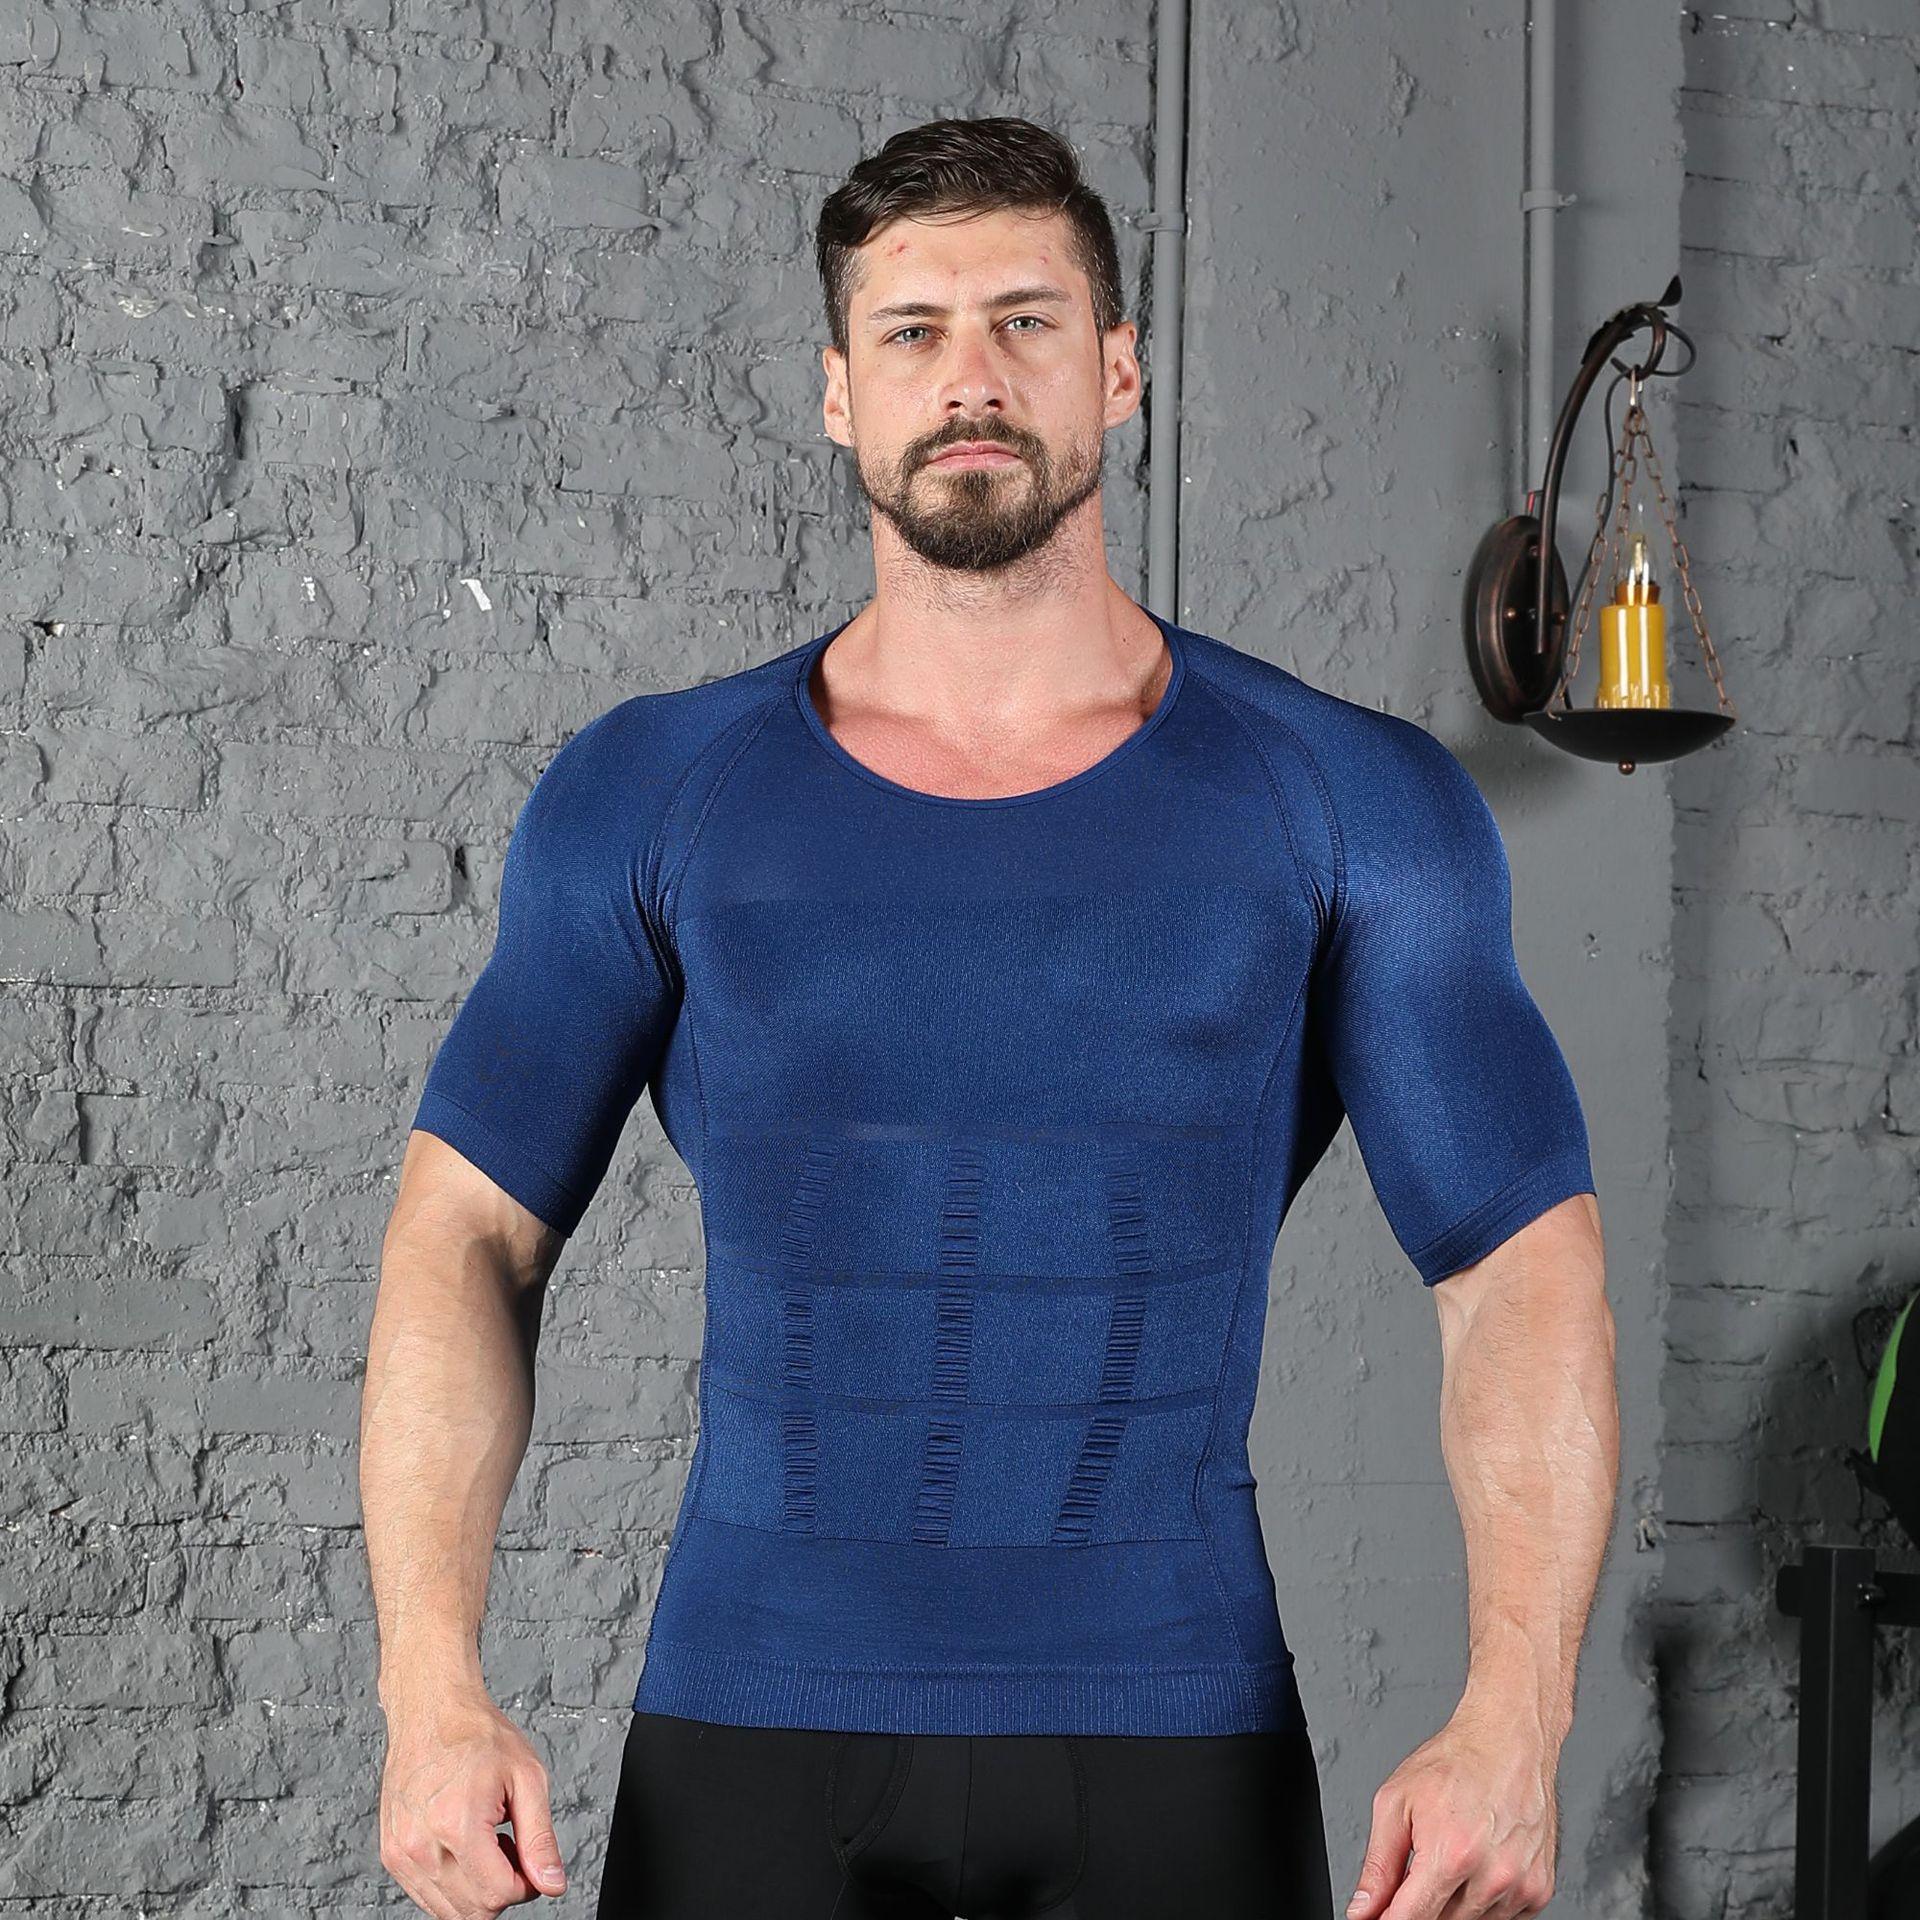 Tone Tee Men Compression Shapewear stretchable underneath bodytoning T-Shirt 3XL